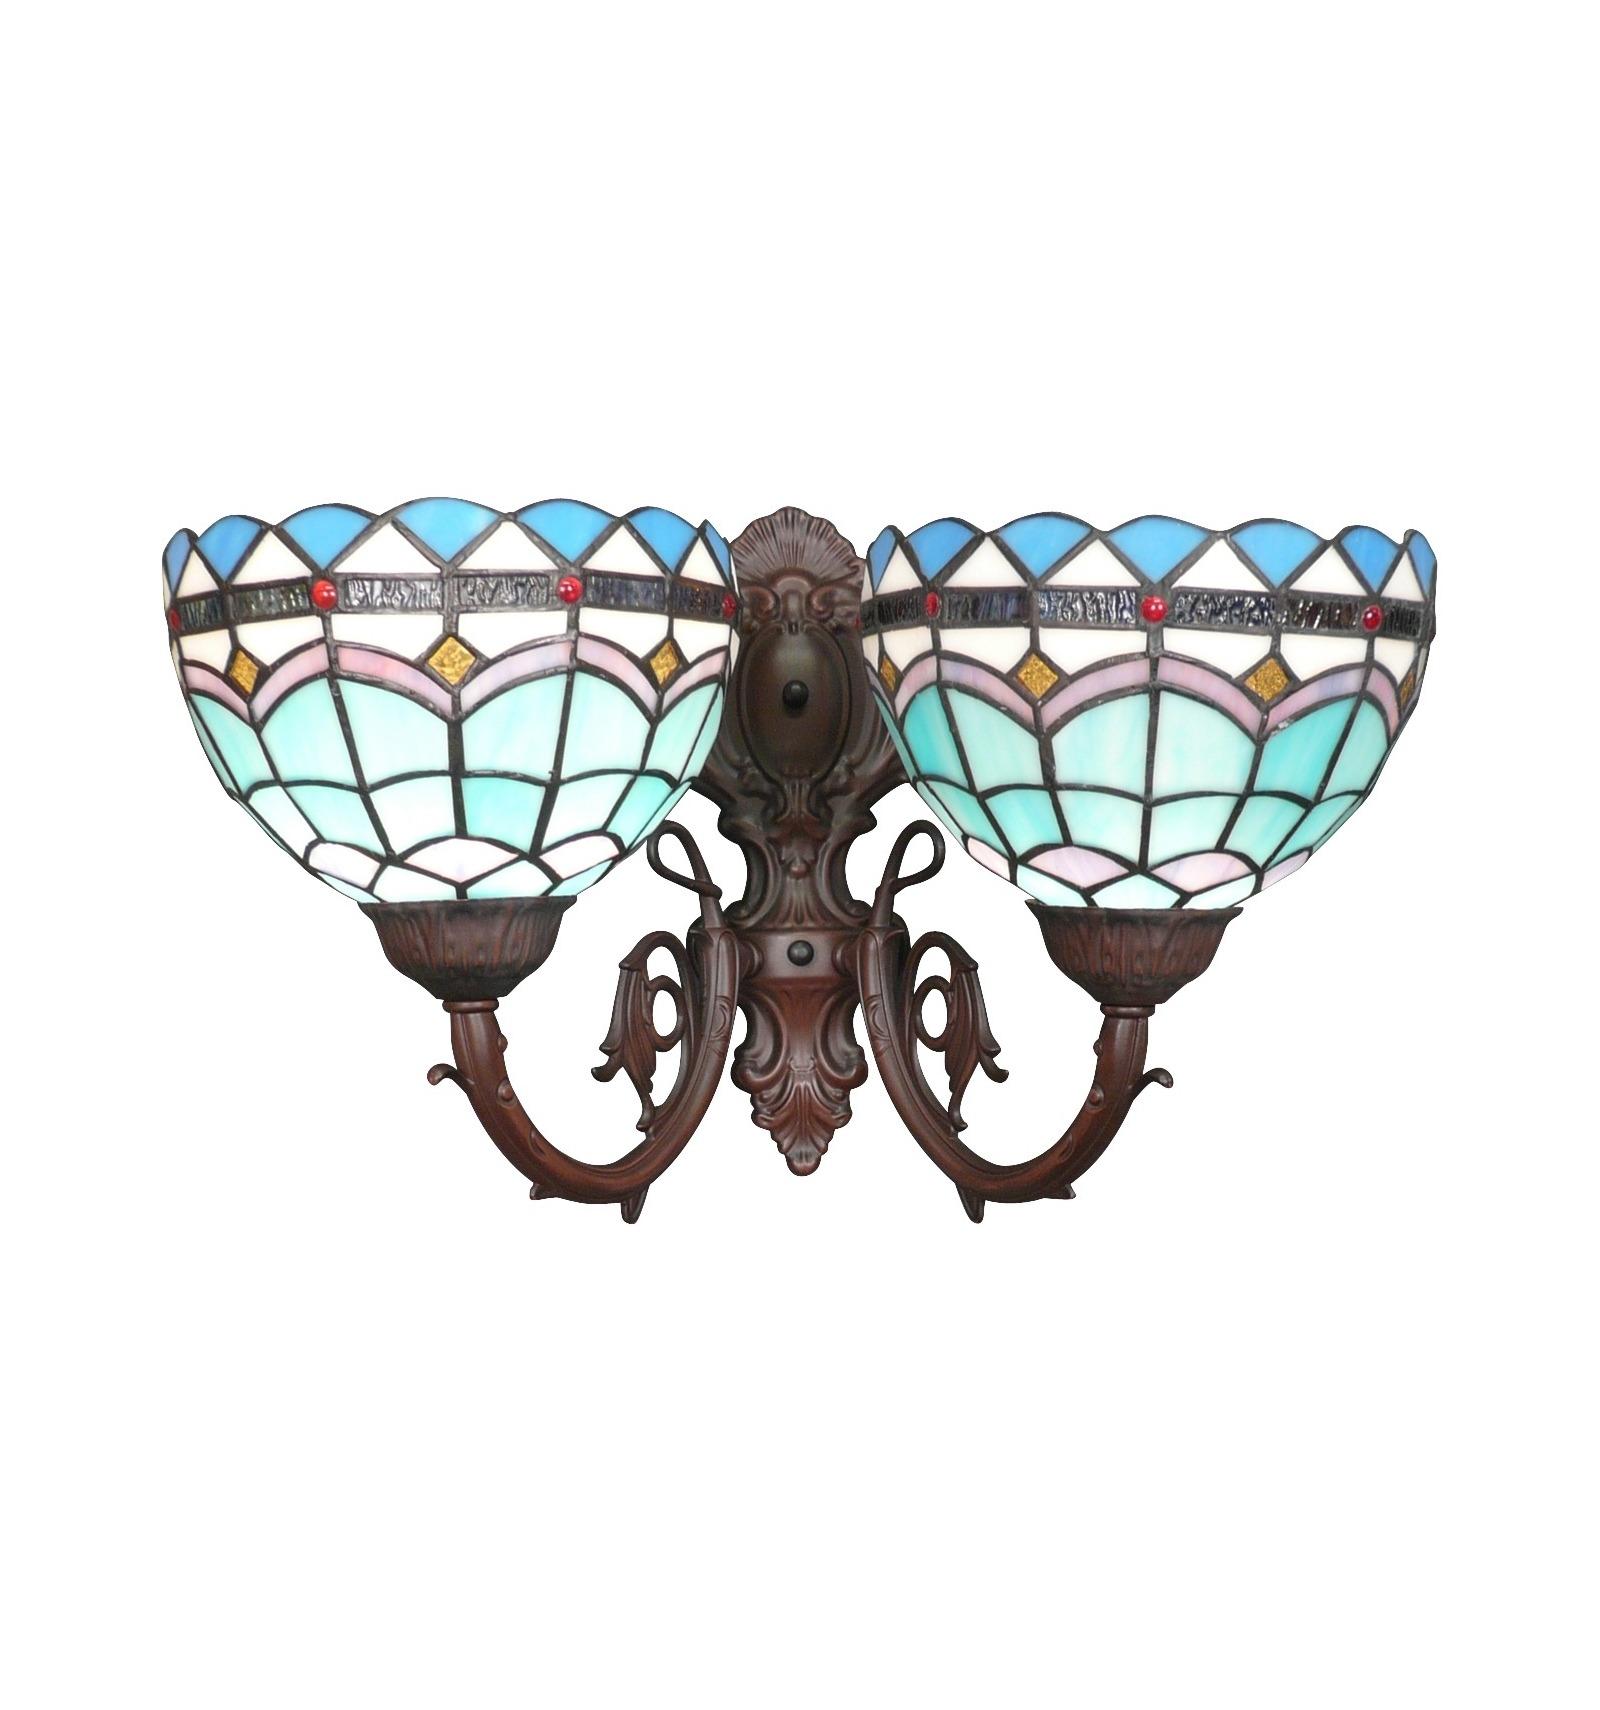 Tiffany аппликации средиземноморской коллекции тиффани светильники